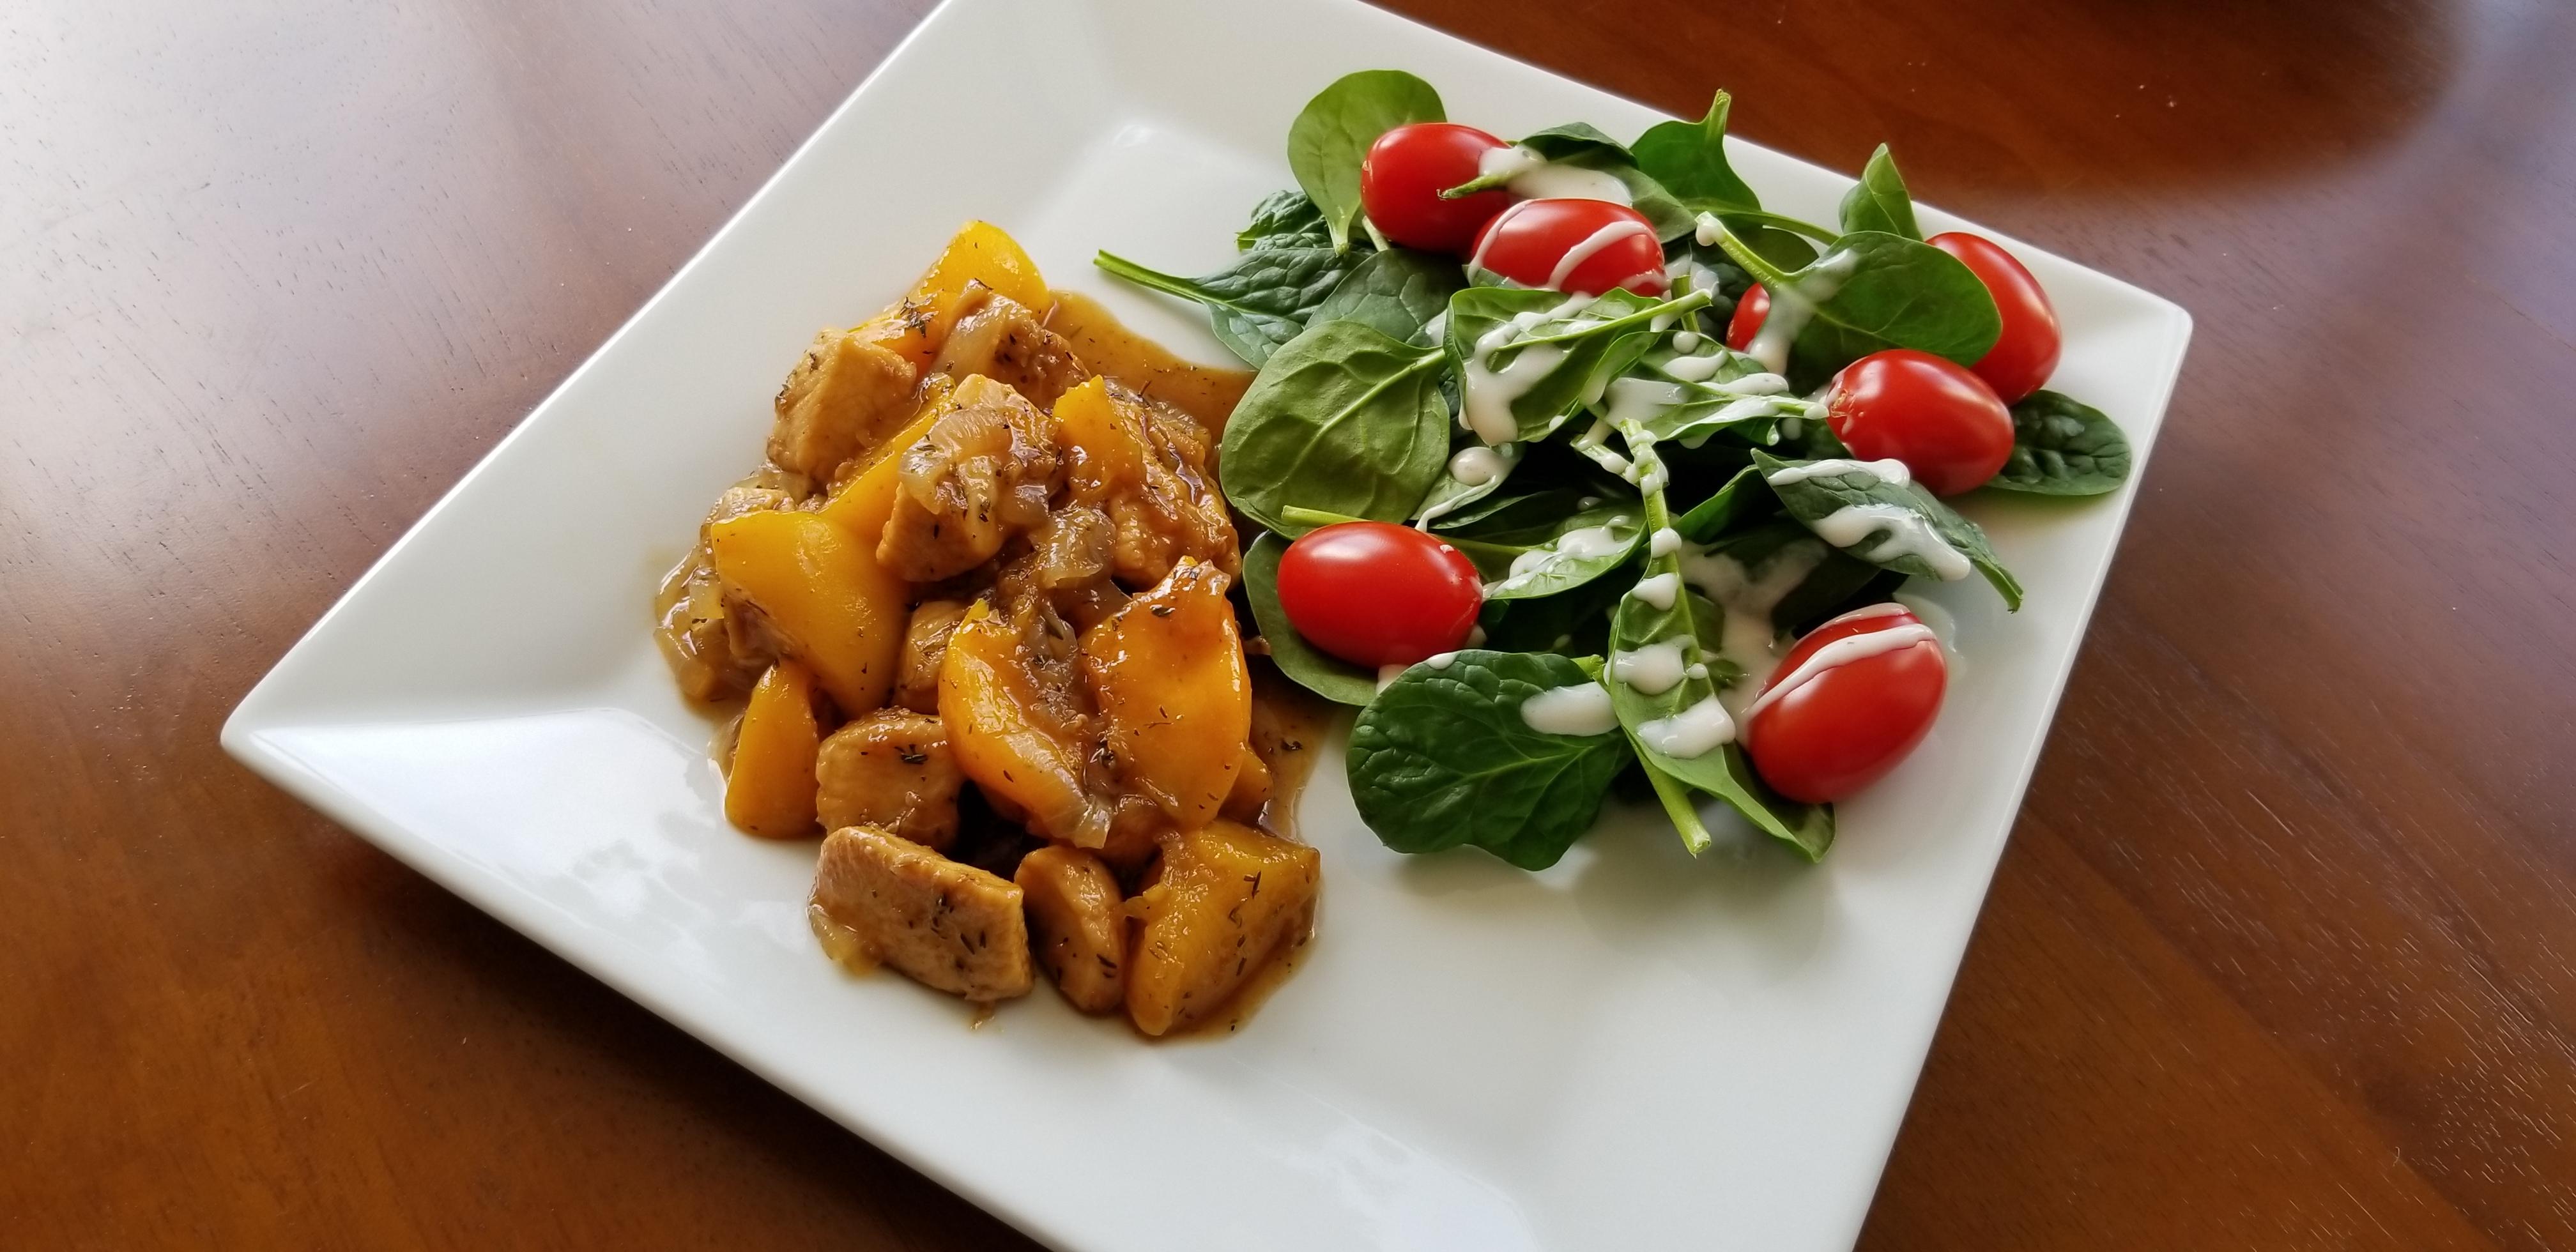 Apricot Chicken with Balsamic Vinegar